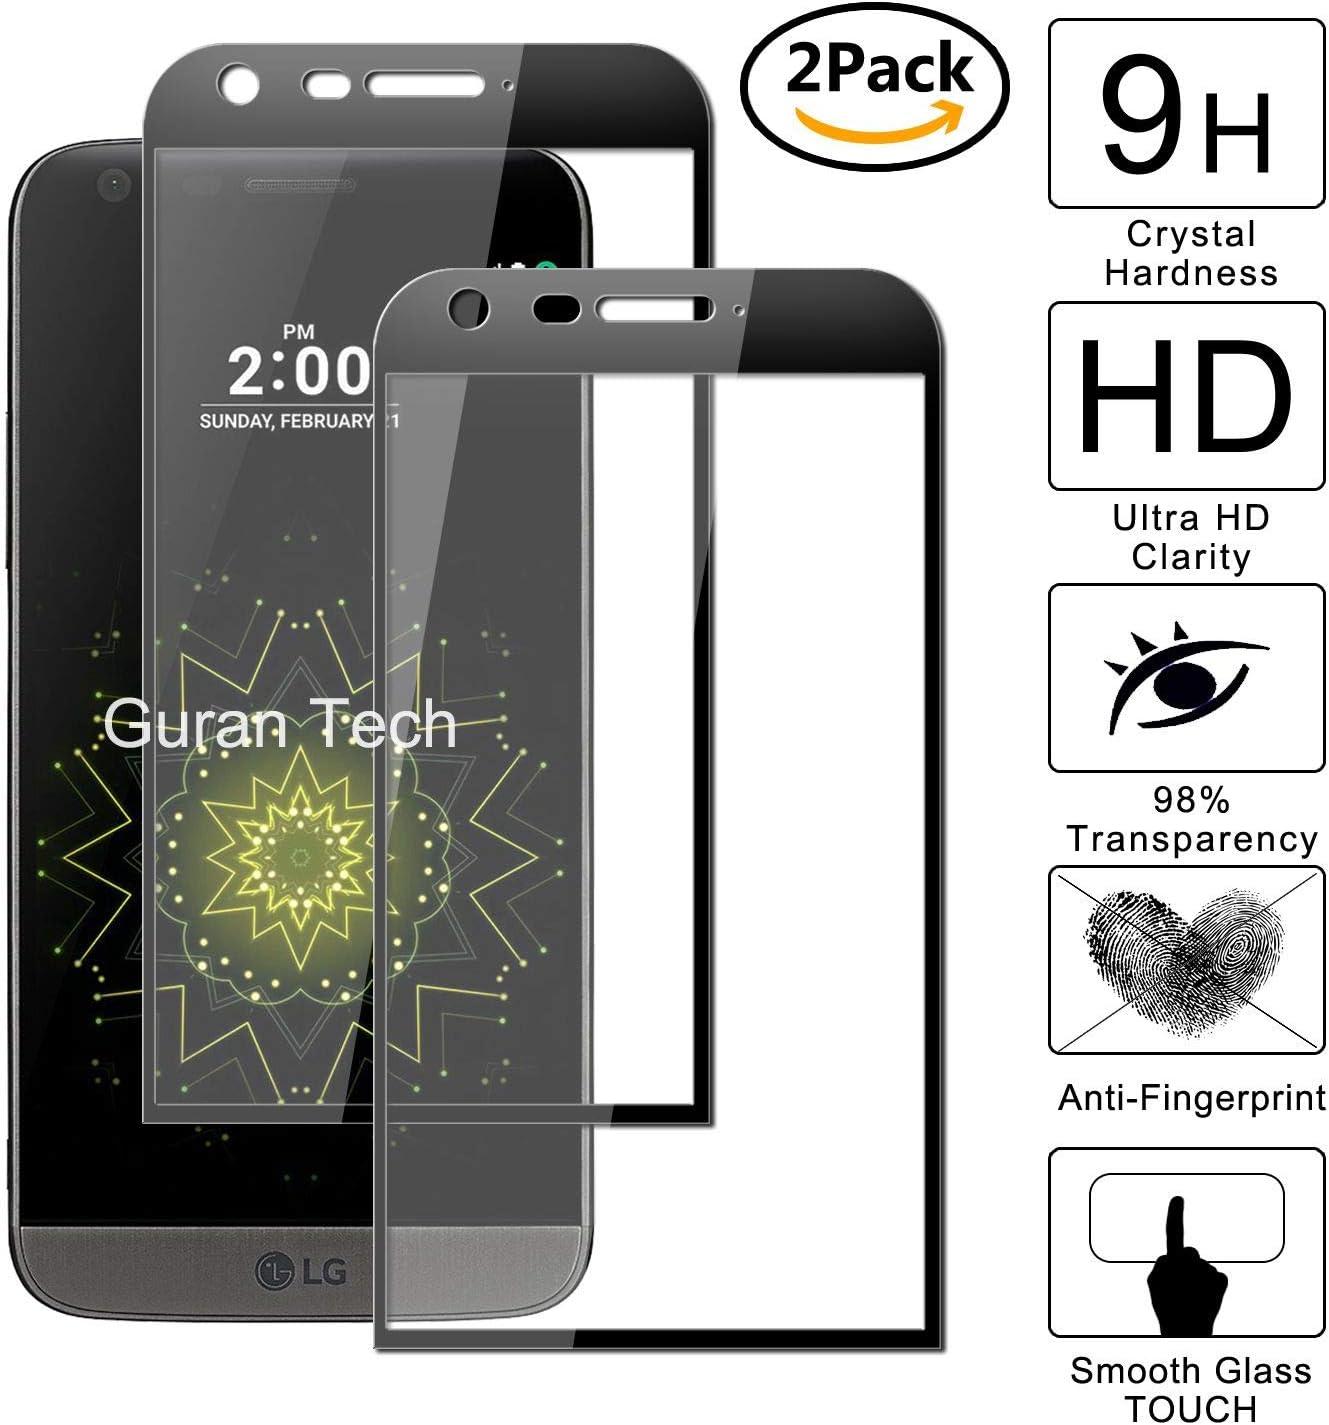 Guran [2 Unidades] Protector de Pantalla Vidrio Cristal Templado para LG G5 Smartphone Glass Vidrio Templado Film (9H, 2.5D Edge, 0.3mm): Amazon.es: Electrónica